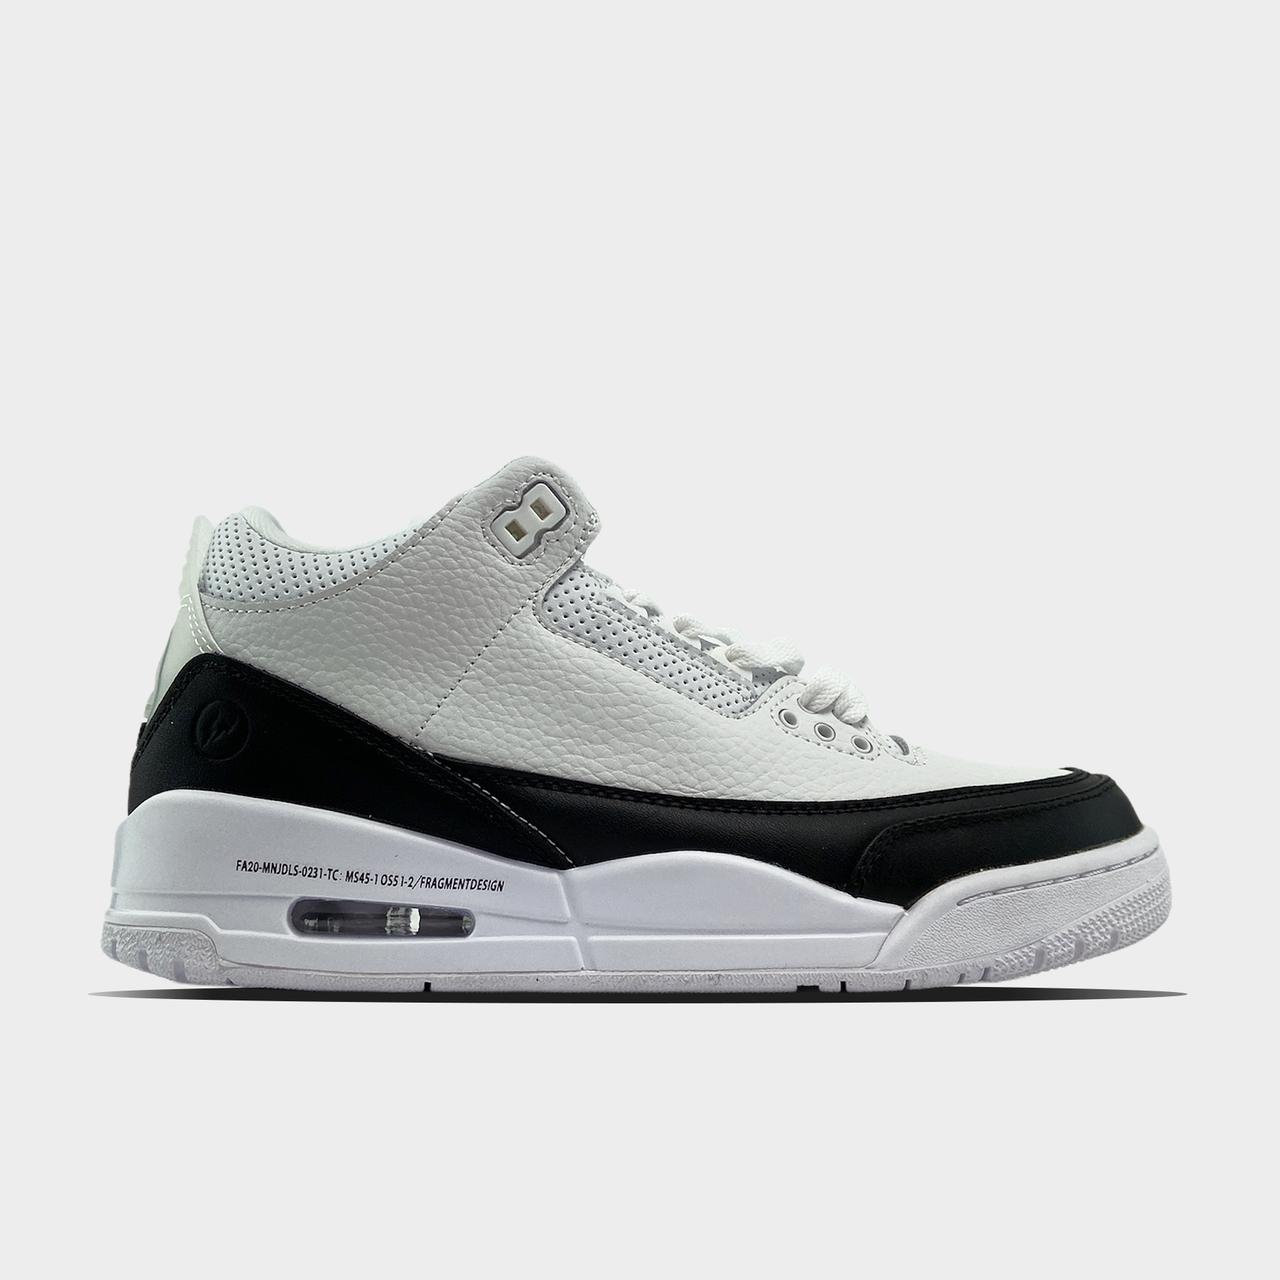 Nike Air Jordan 3 White Black (Білий)